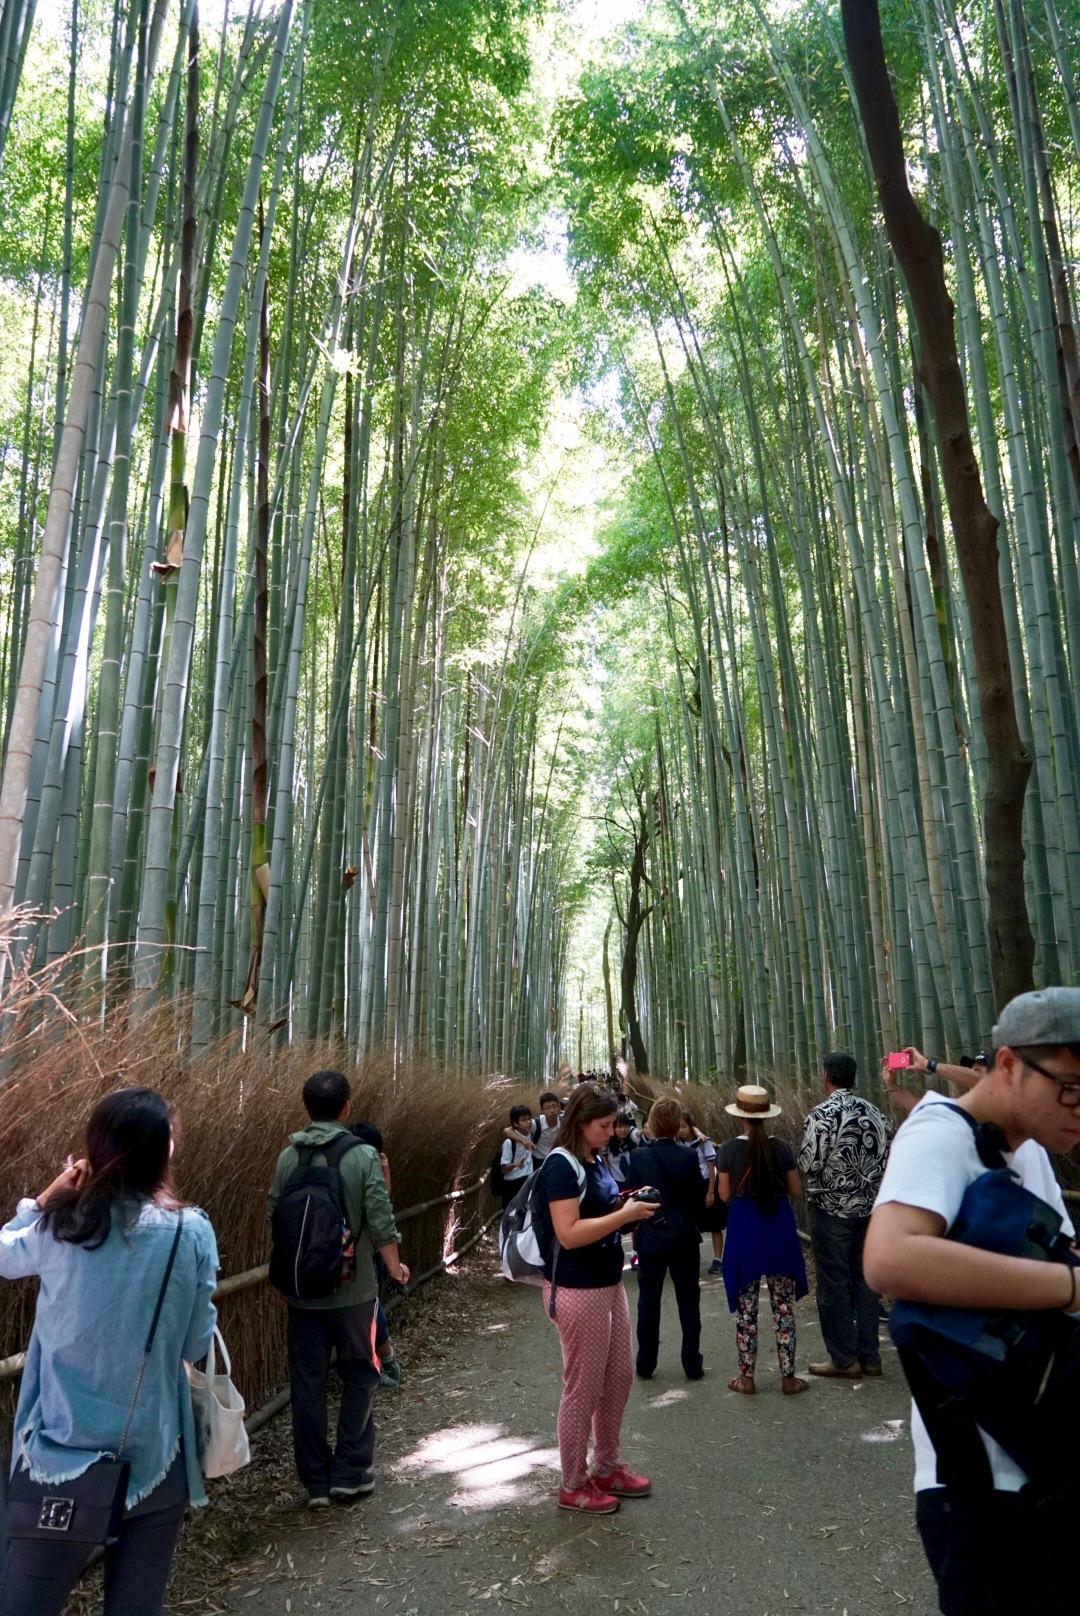 arashiyama bamboo grove  - gobeforethe crowds or not at all....